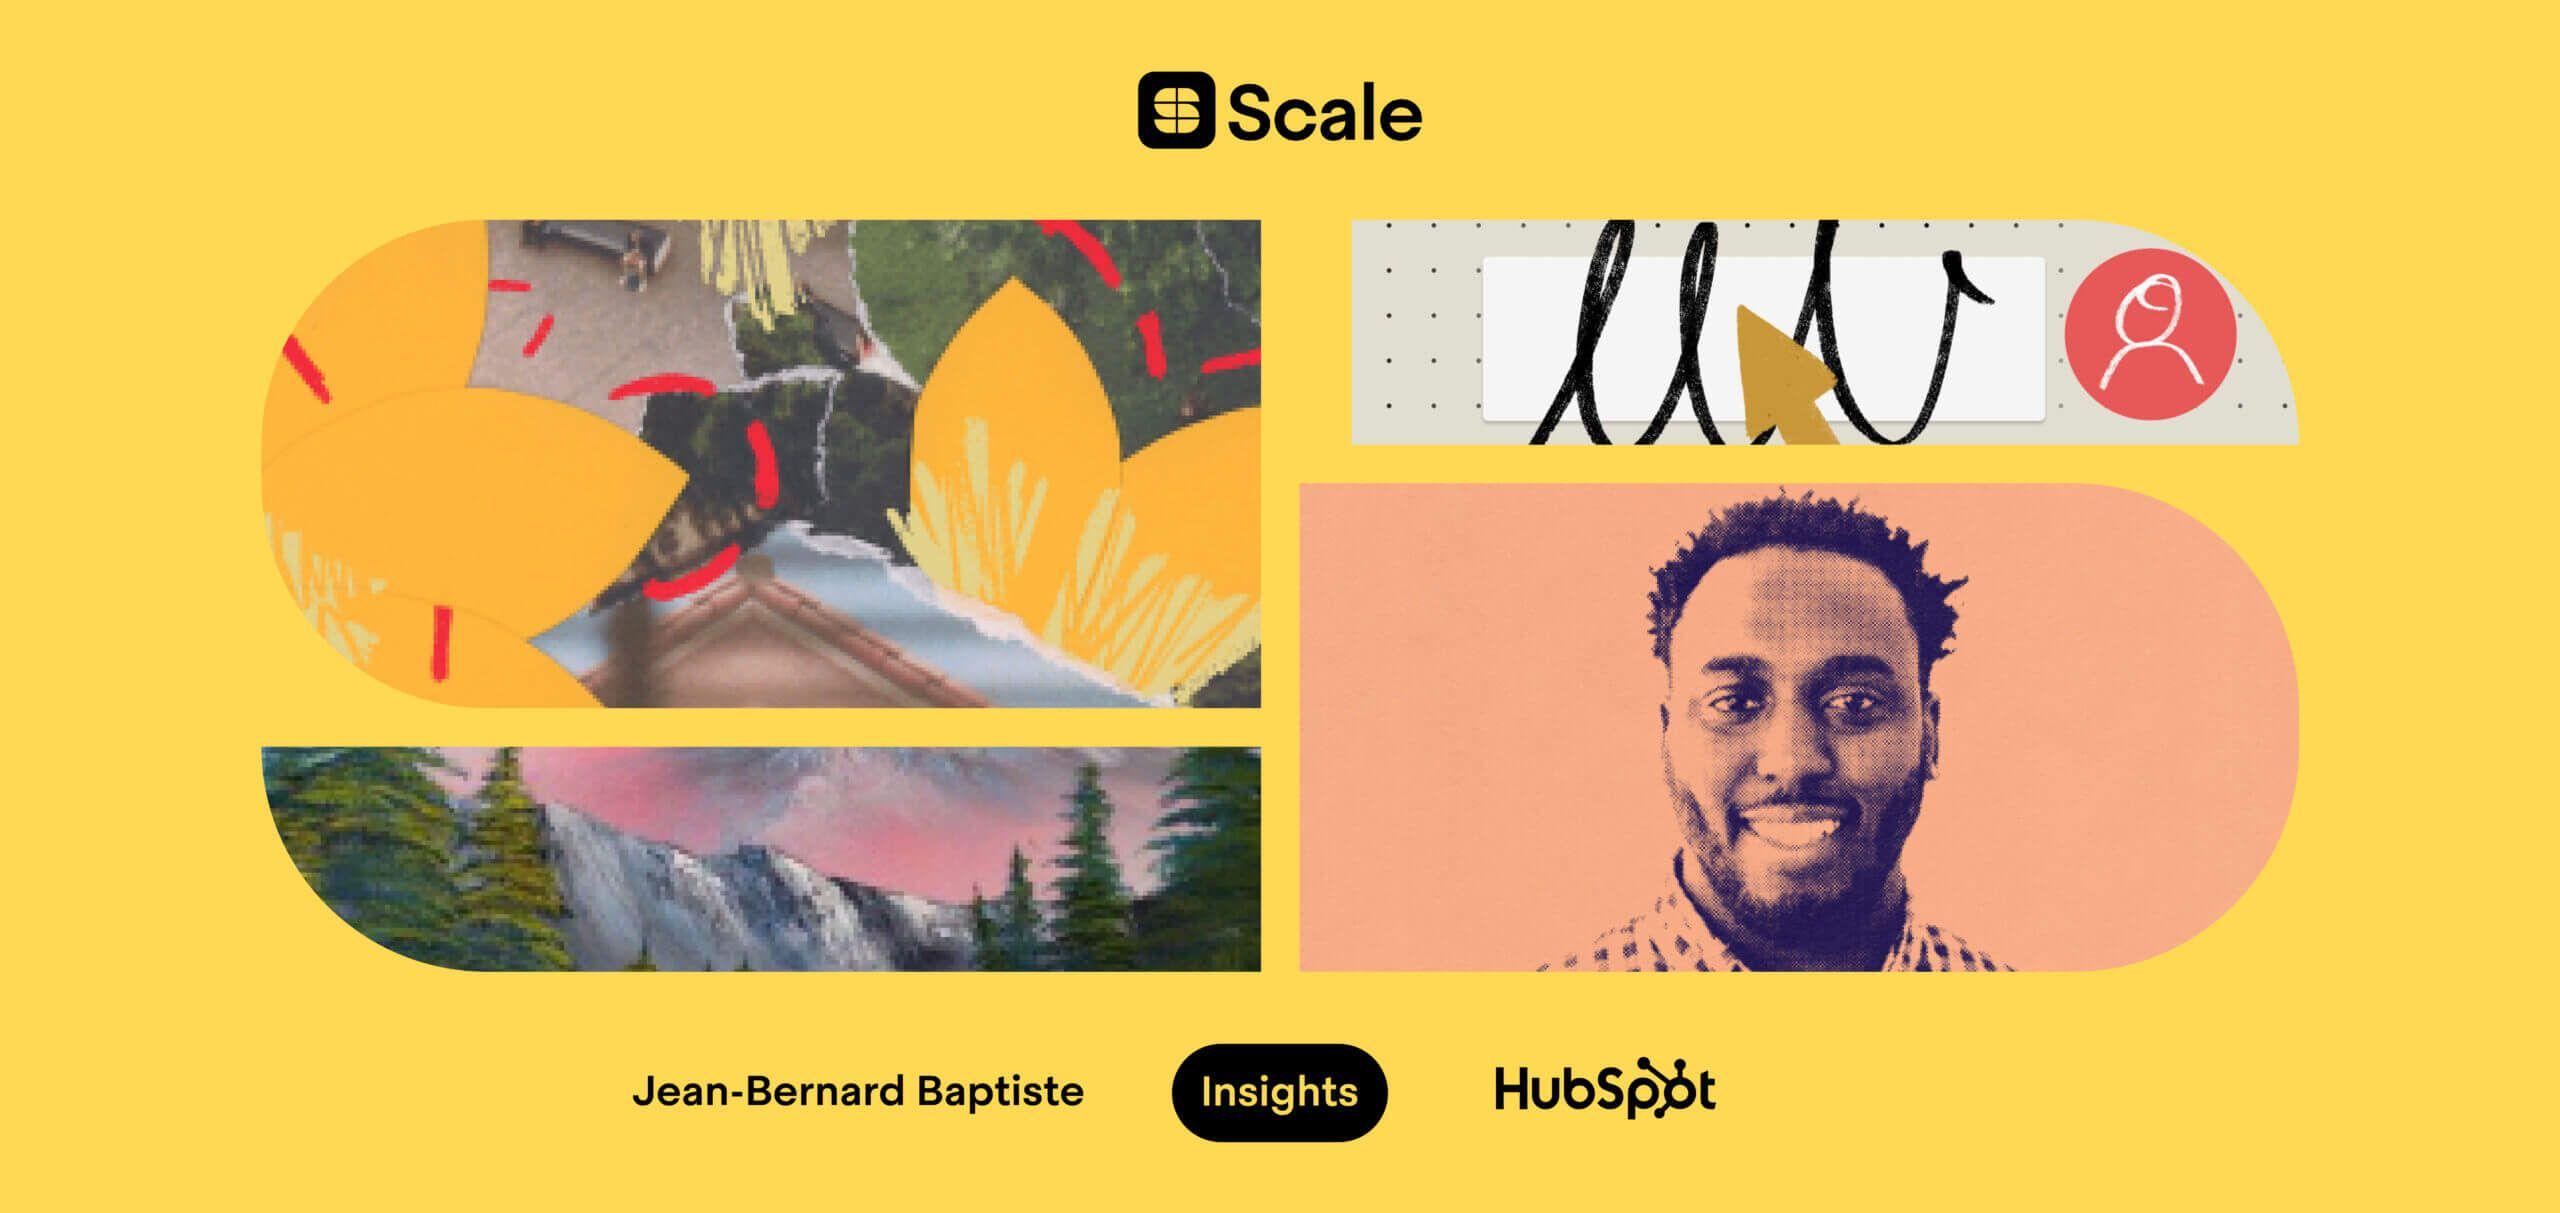 Success at scale: HubSpot's Jean-Bernard Baptiste on unlocking business growth through great customer experiences